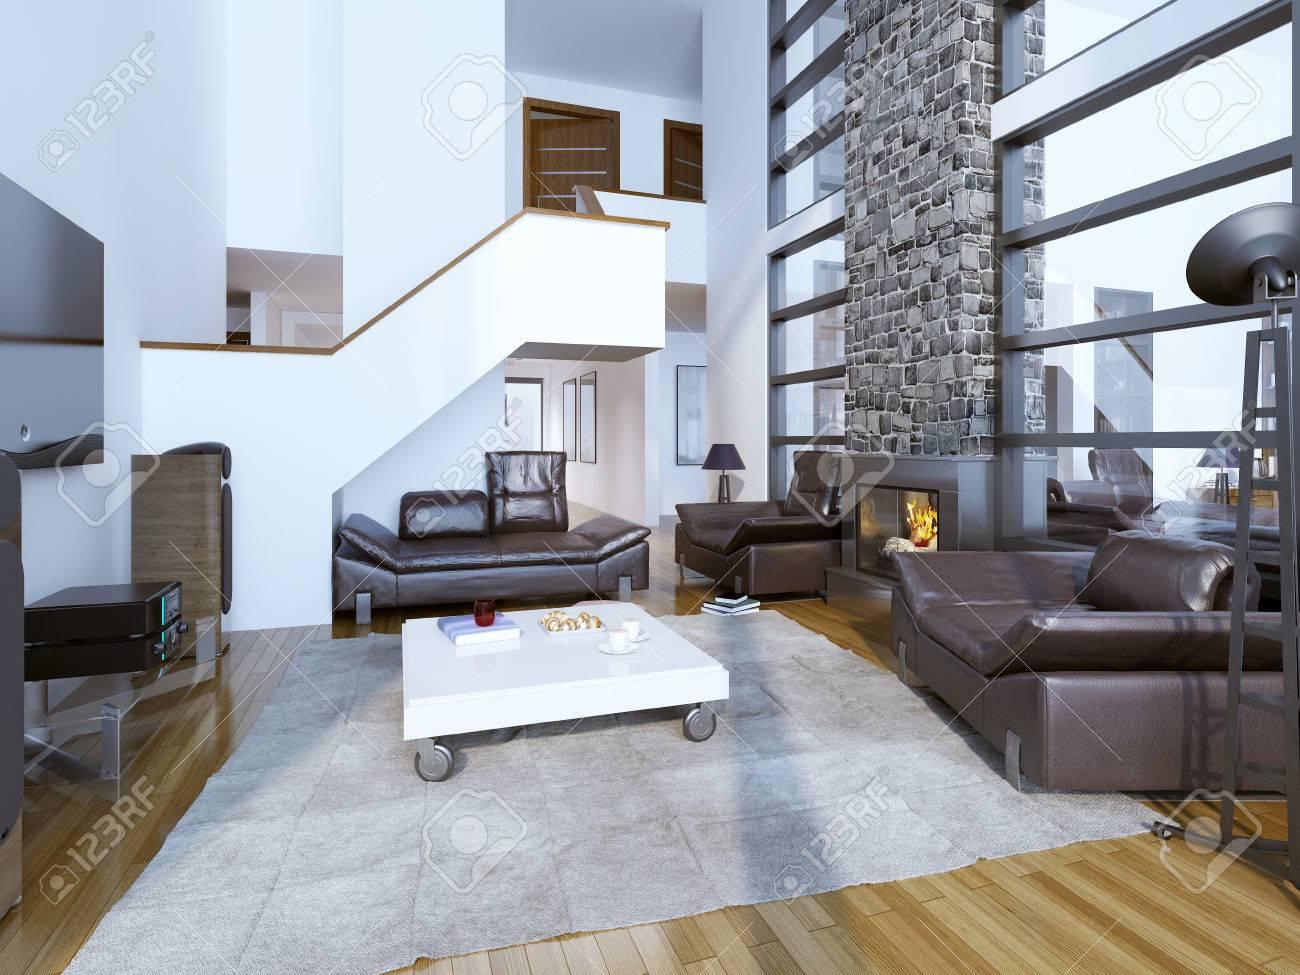 Design Of Cozy Modern Living Room. High Ceiling Room Interior ...